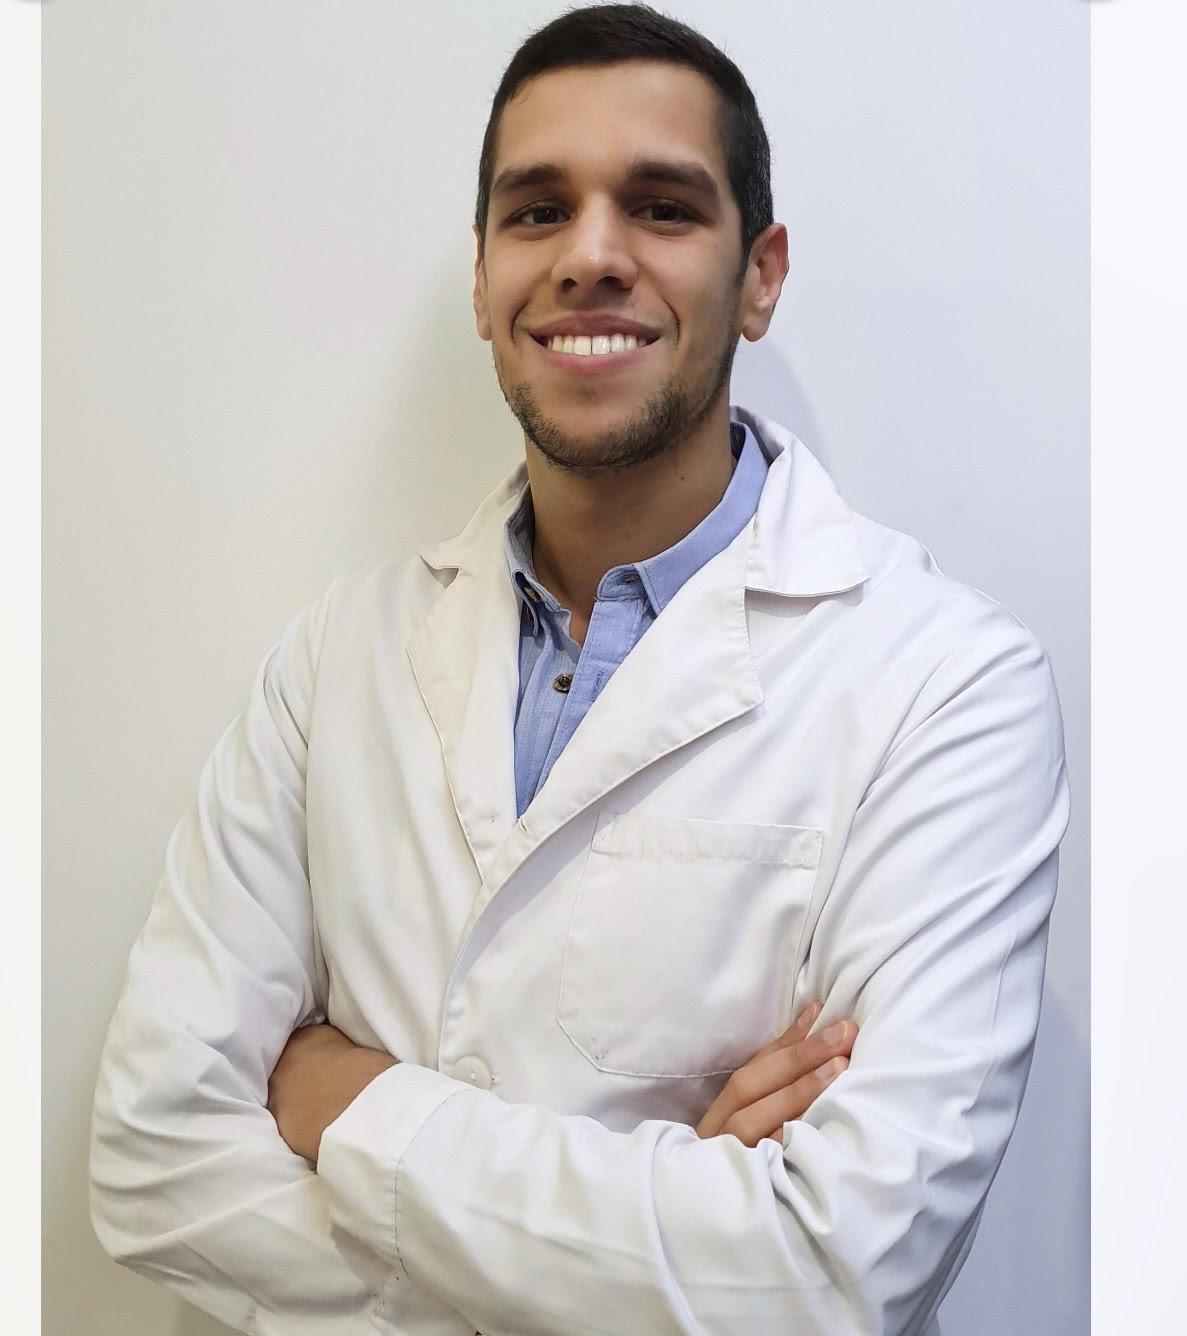 Jóni Seabra da Costa Carvalho